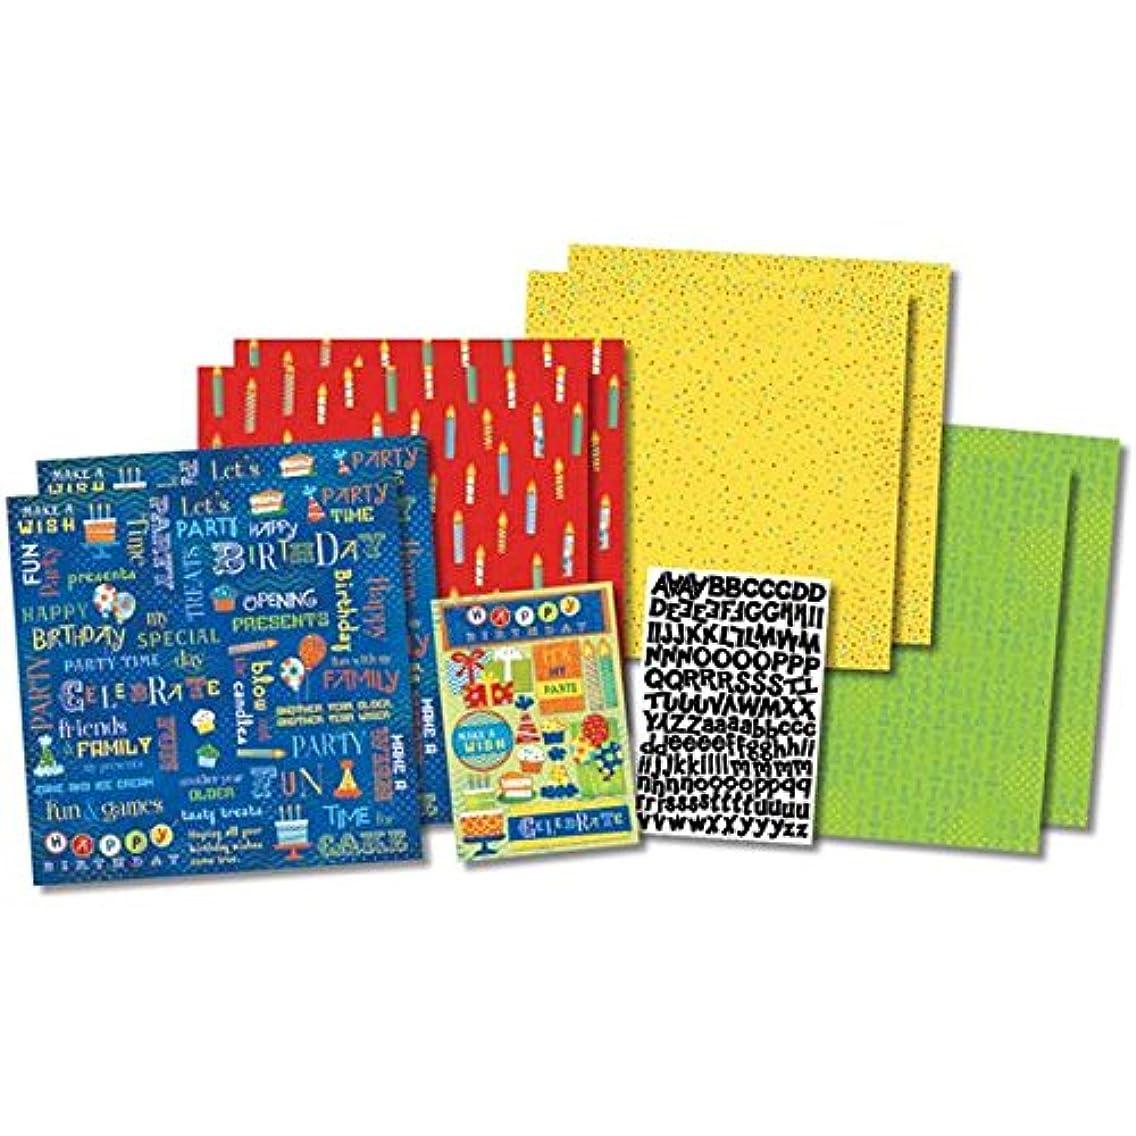 Karen Foster Design Themed Paper and Stickers Scrapbook Kit, Birthday